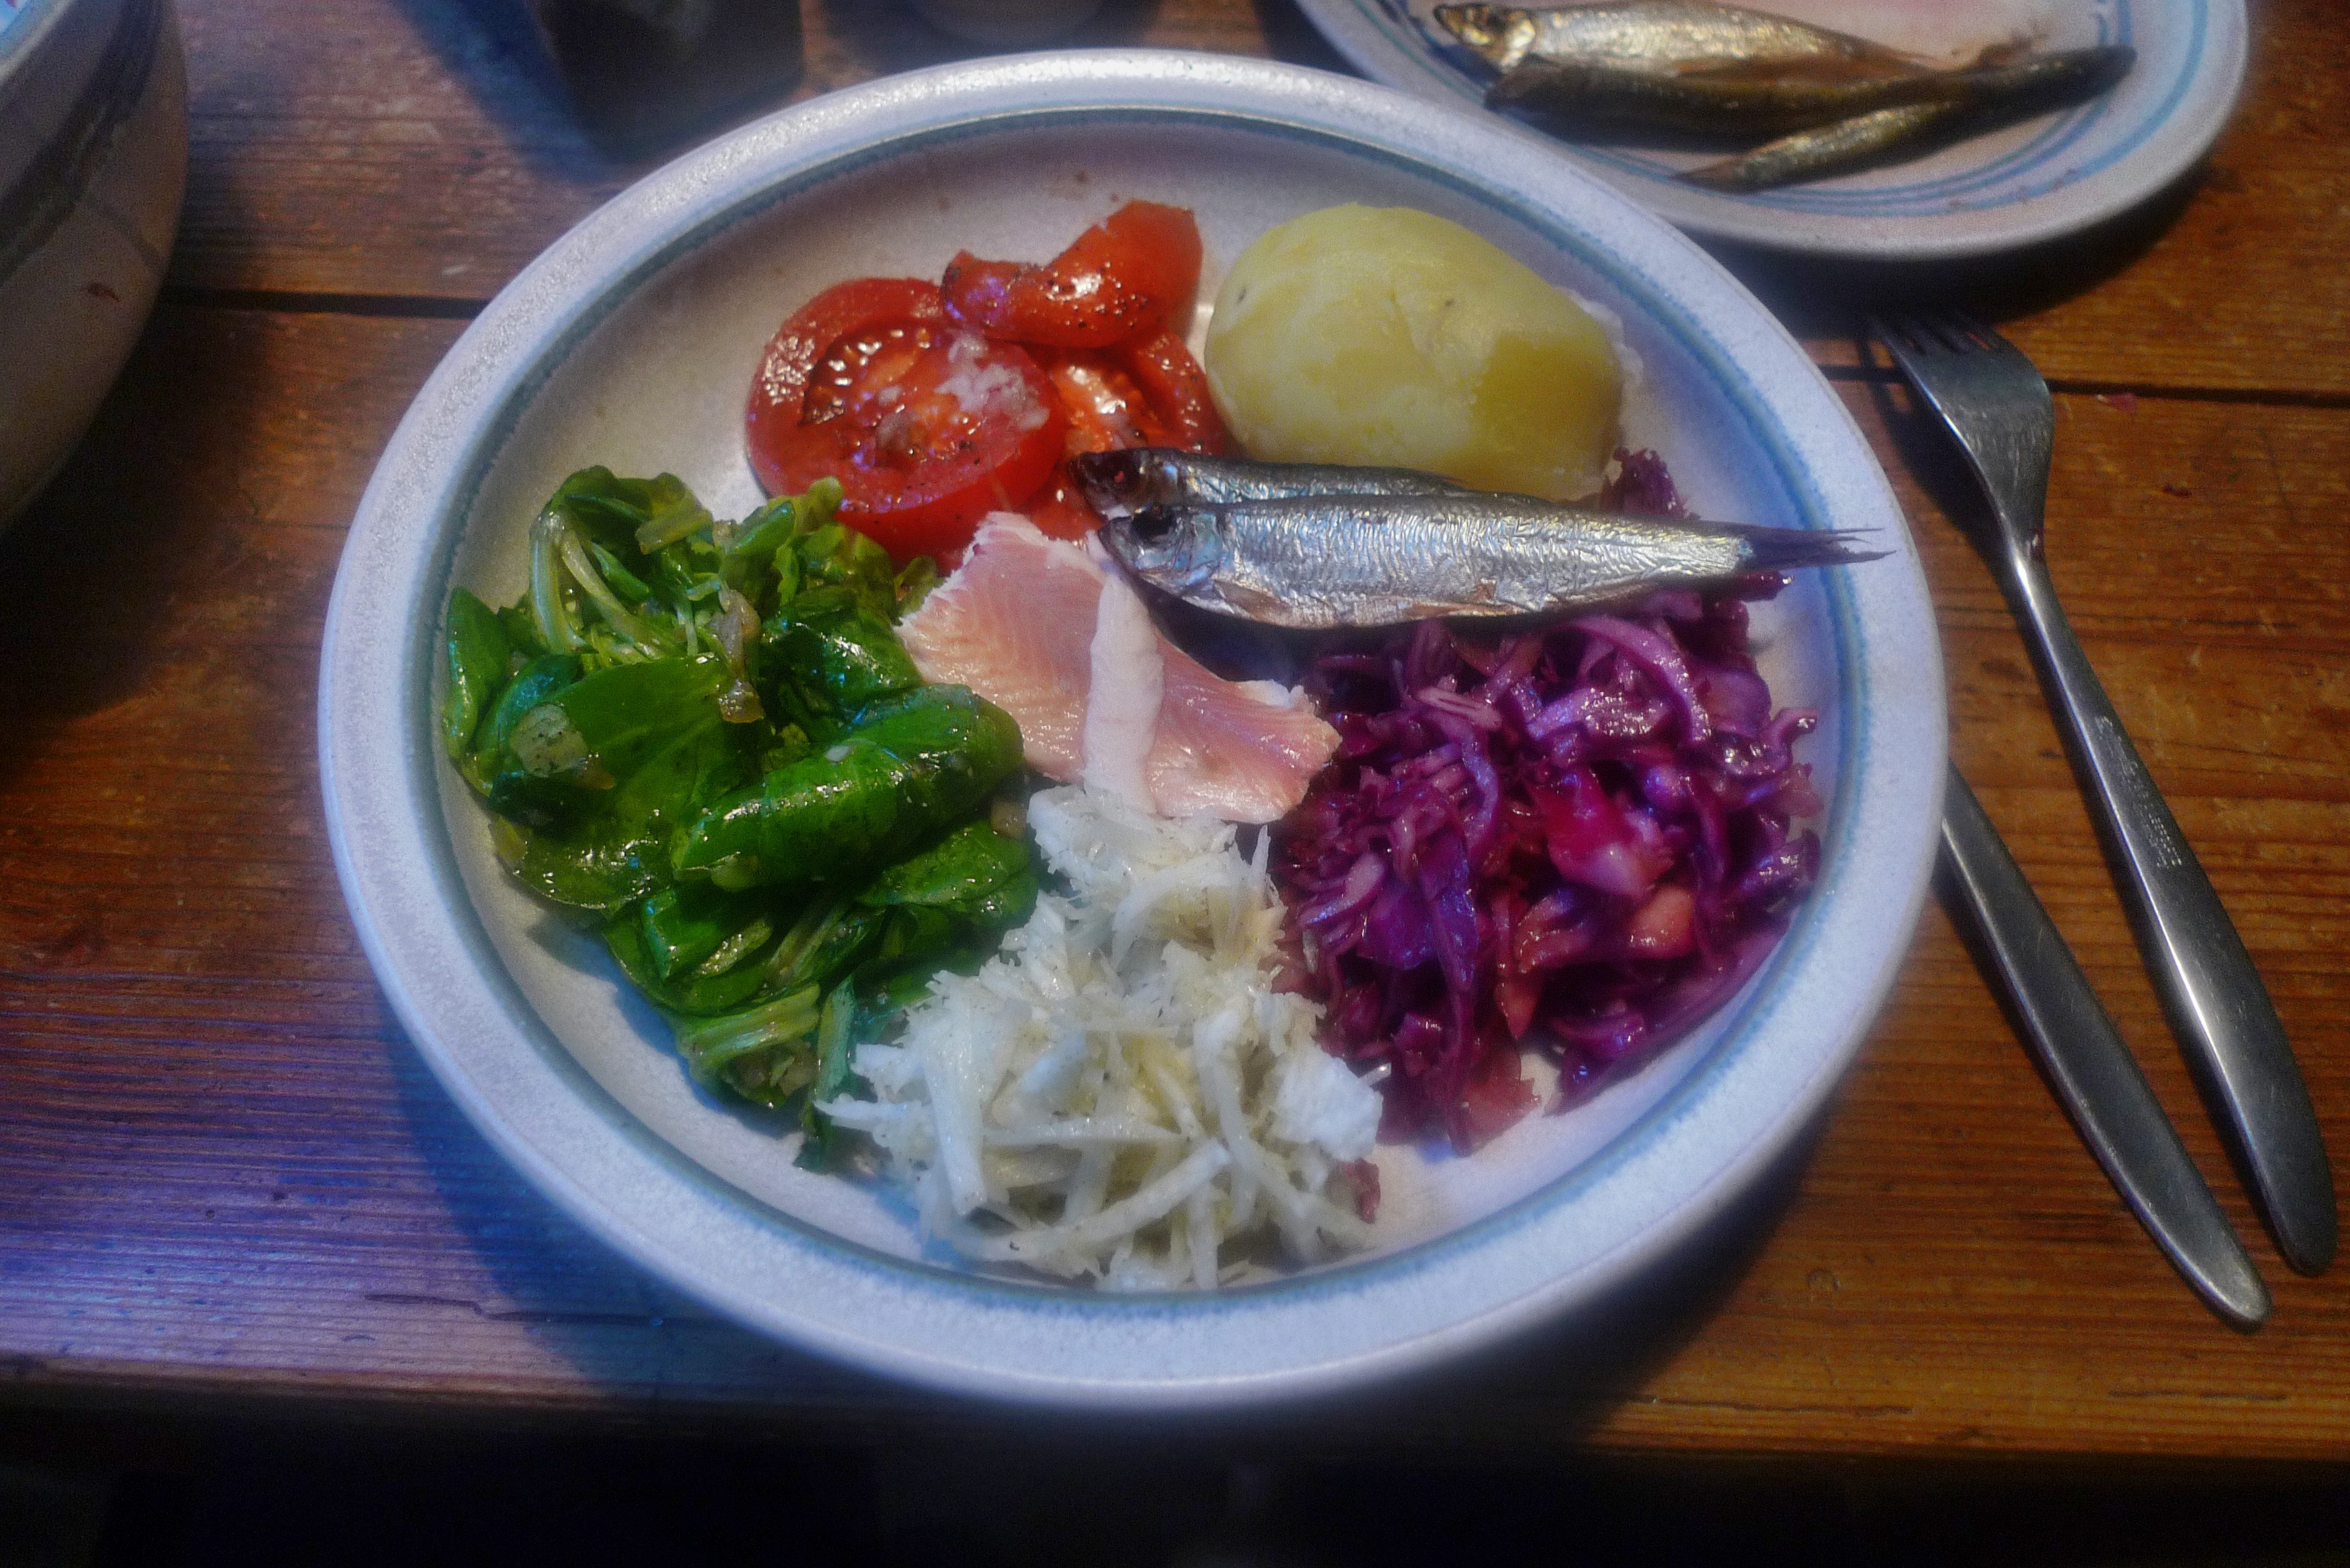 Foewllw-Salate-Kartoffeln-24.10-14   (8)